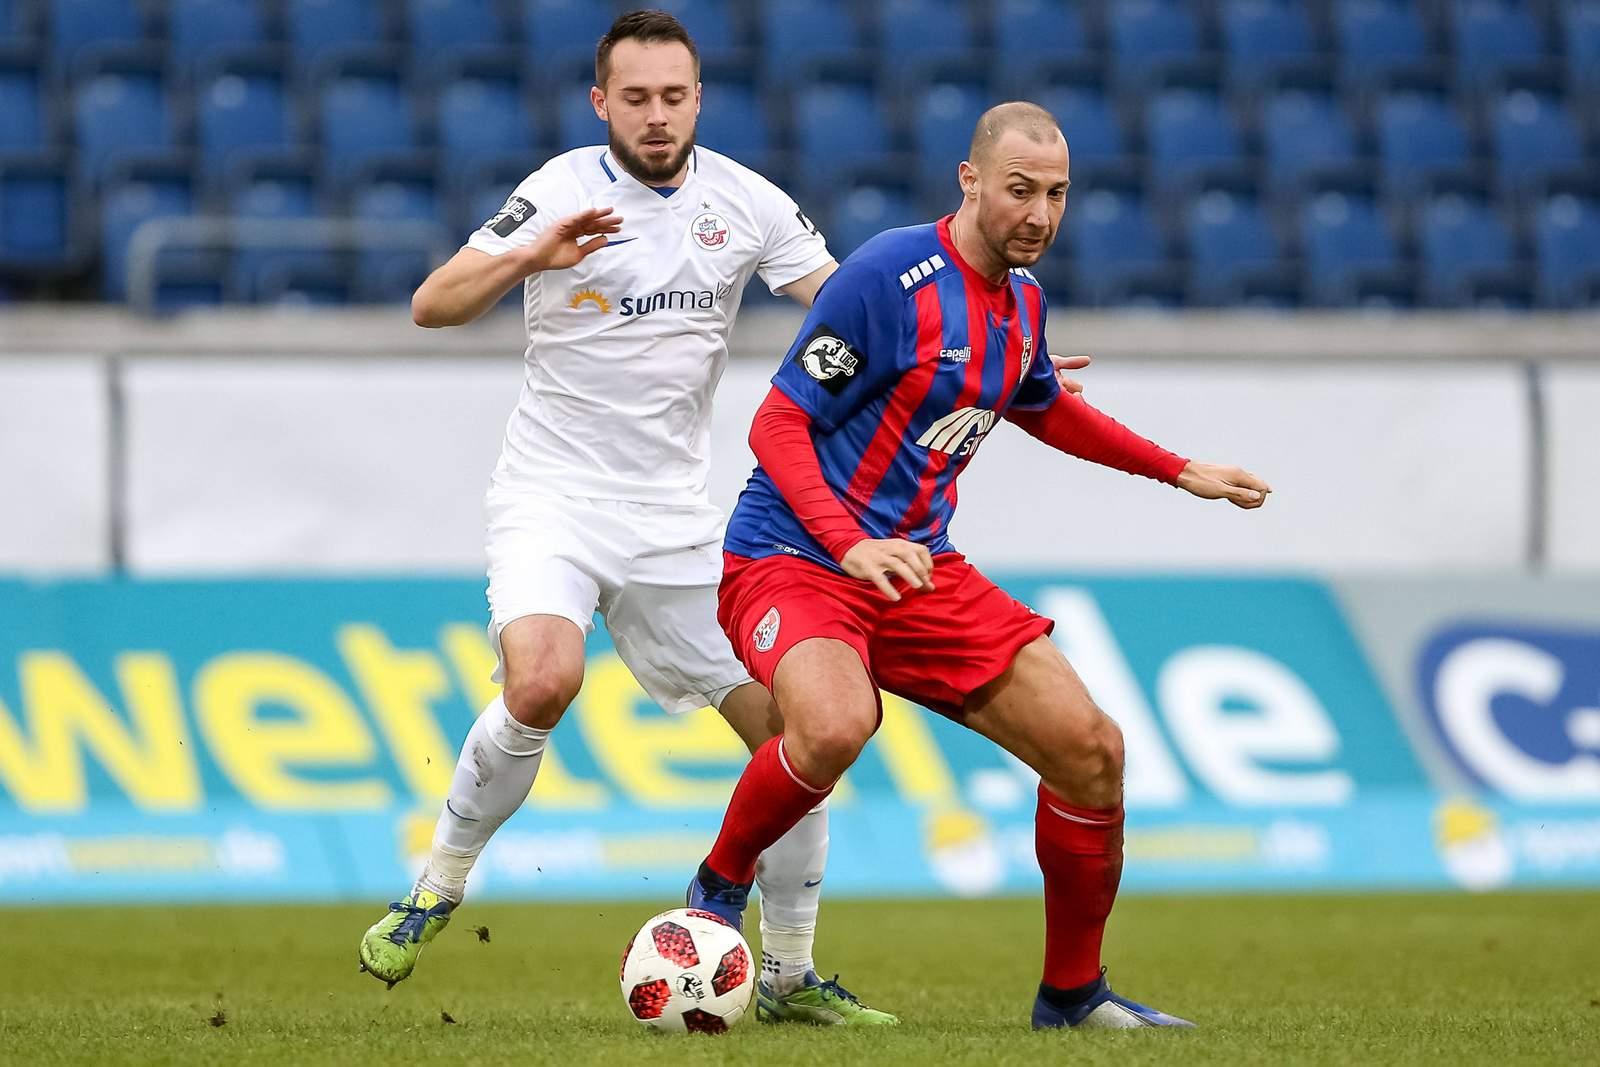 Tanju Öztürk im Spiel gegen Hansa Rostock